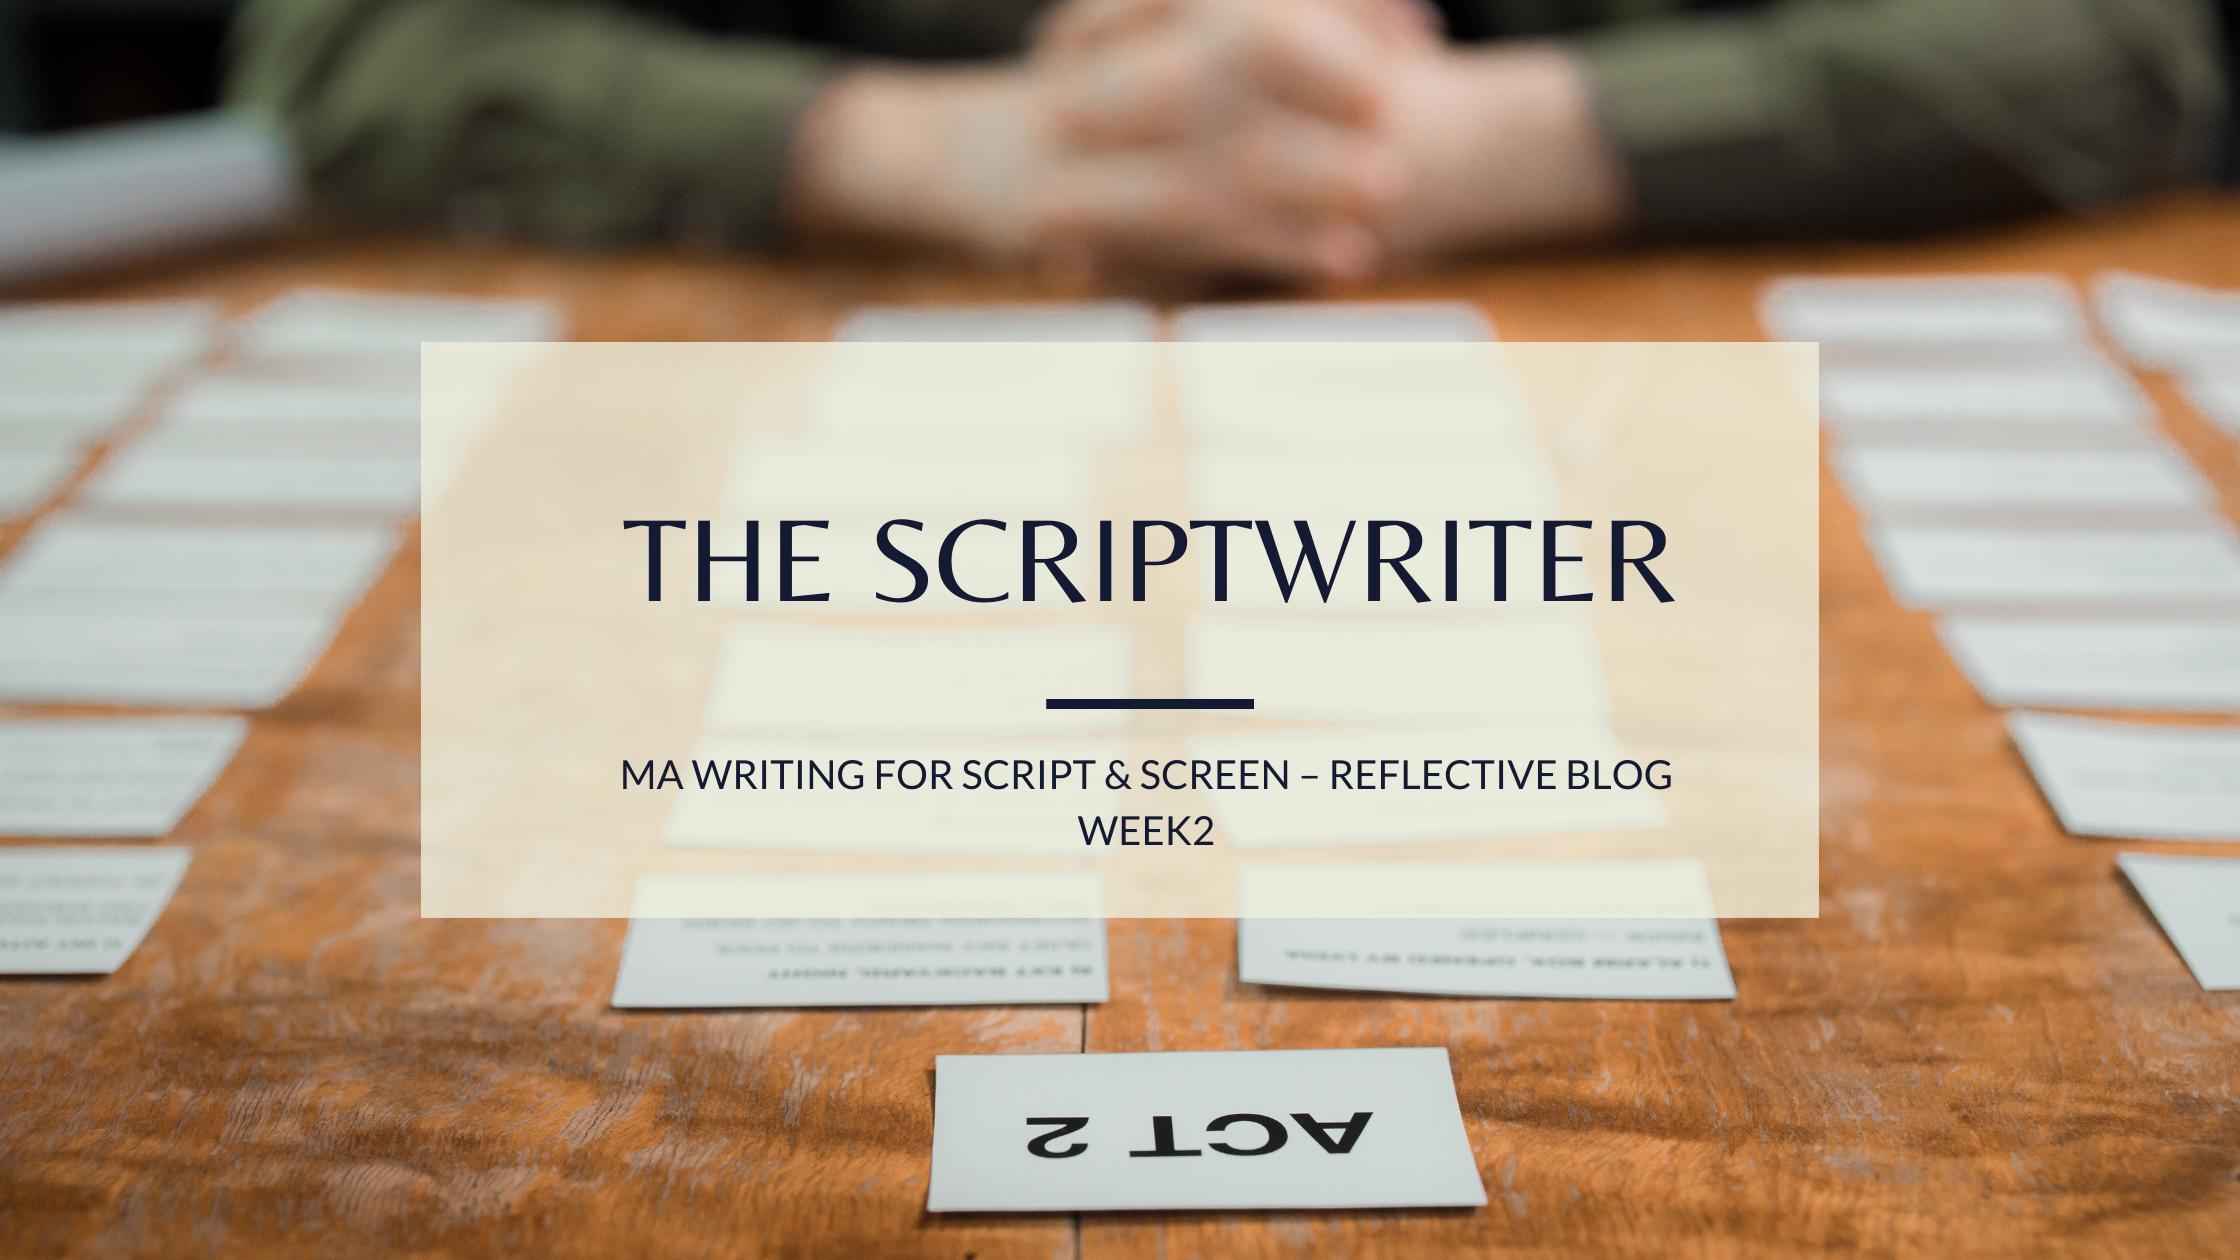 The Scriptwriter